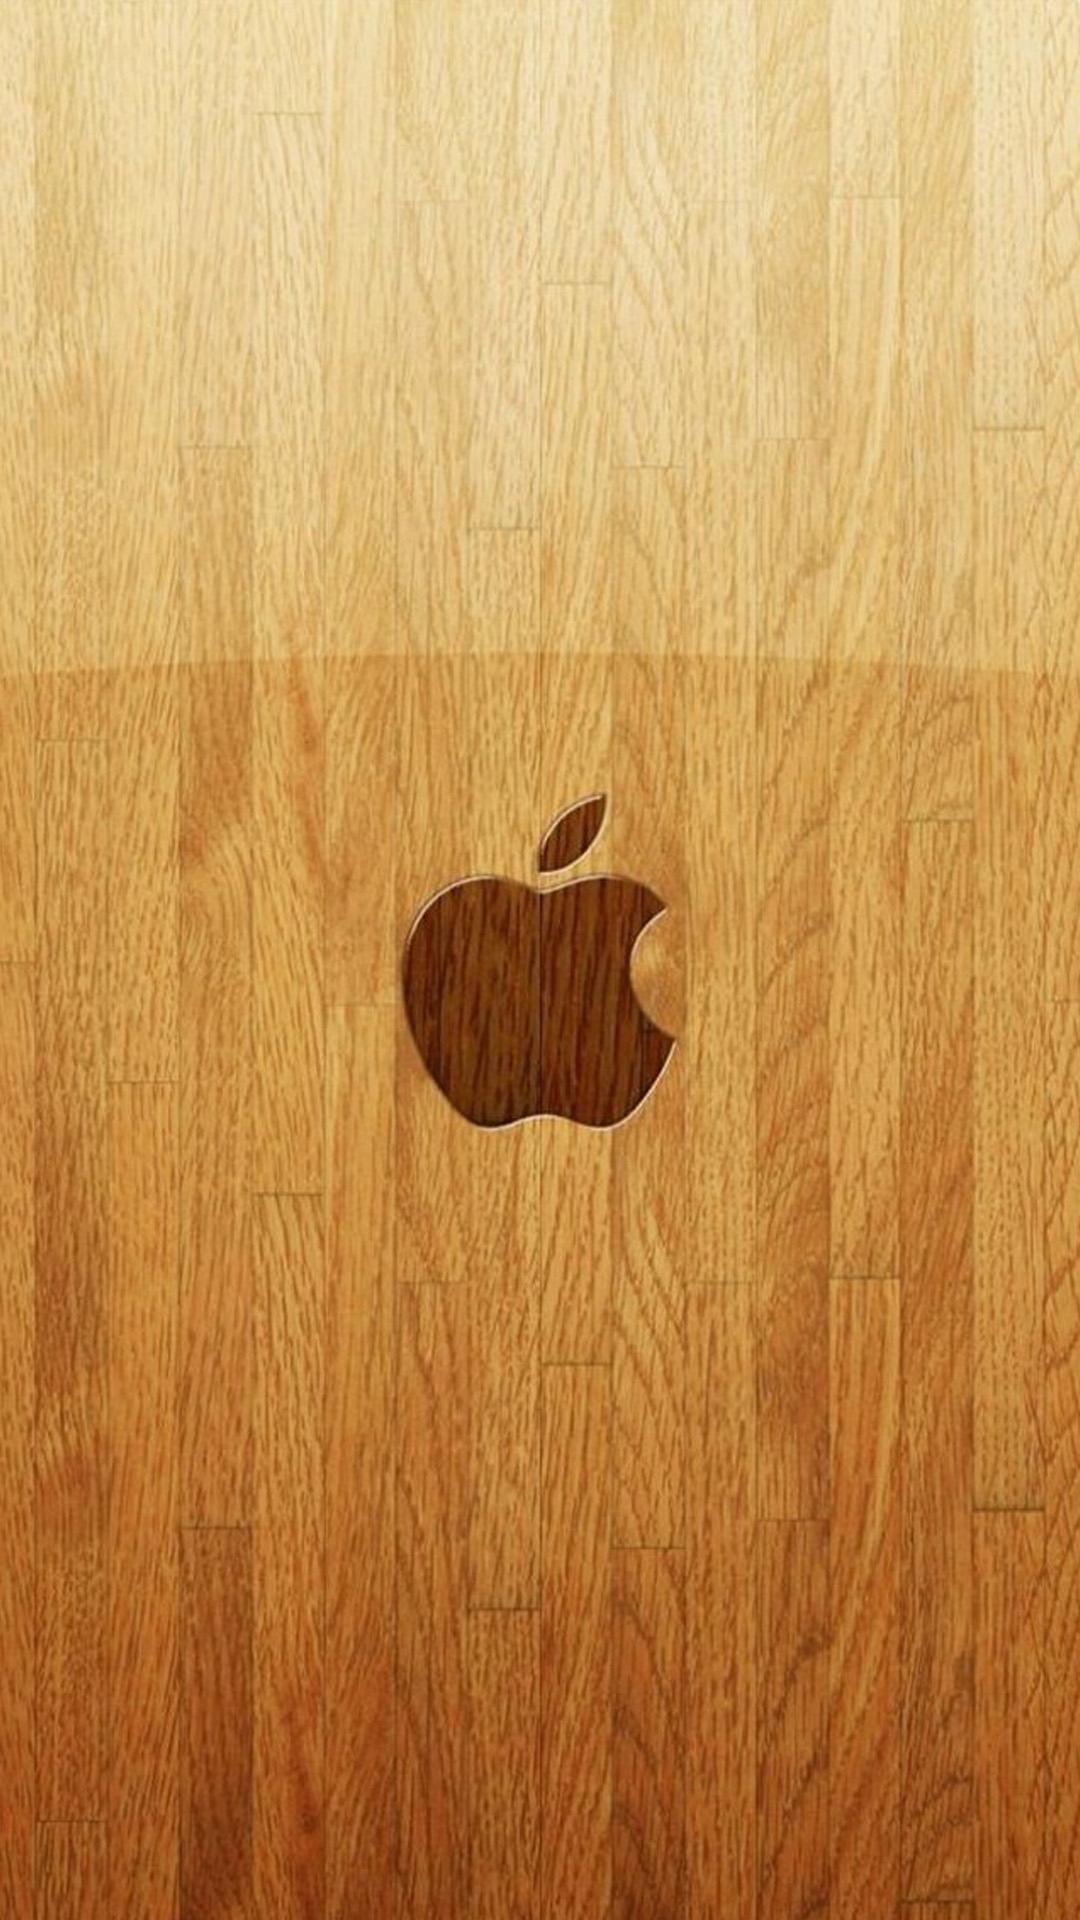 Apple iPhone 6 Plus Wallpaper 343 iPhone 6 Plus Wallpapers HD 1080x1920